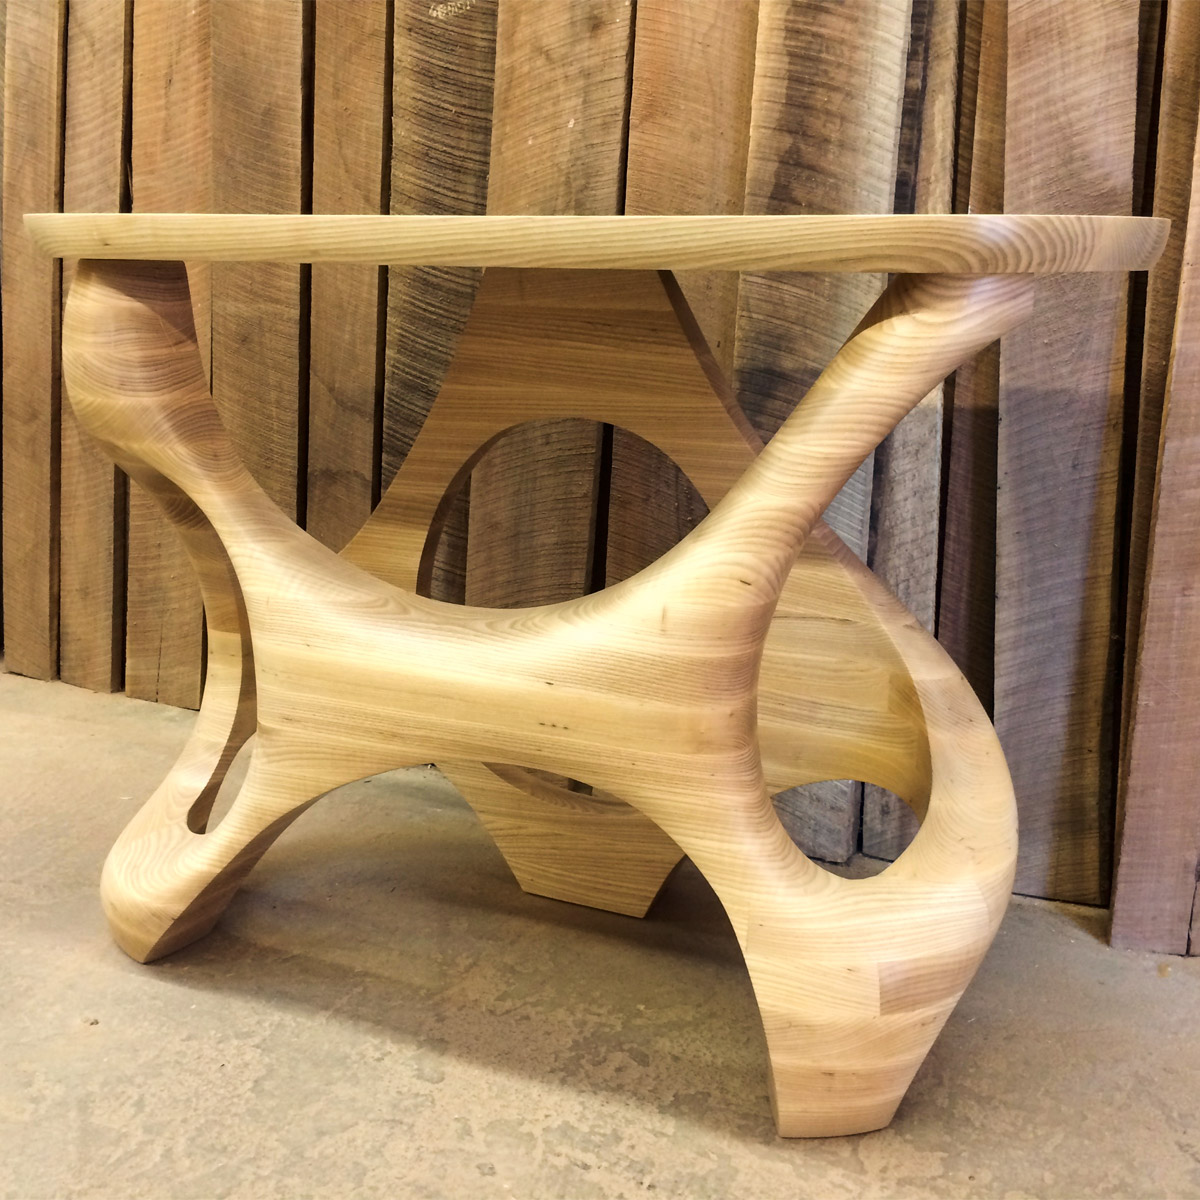 Caleb-Woodard-Lissome-Side-Table_1.jpg